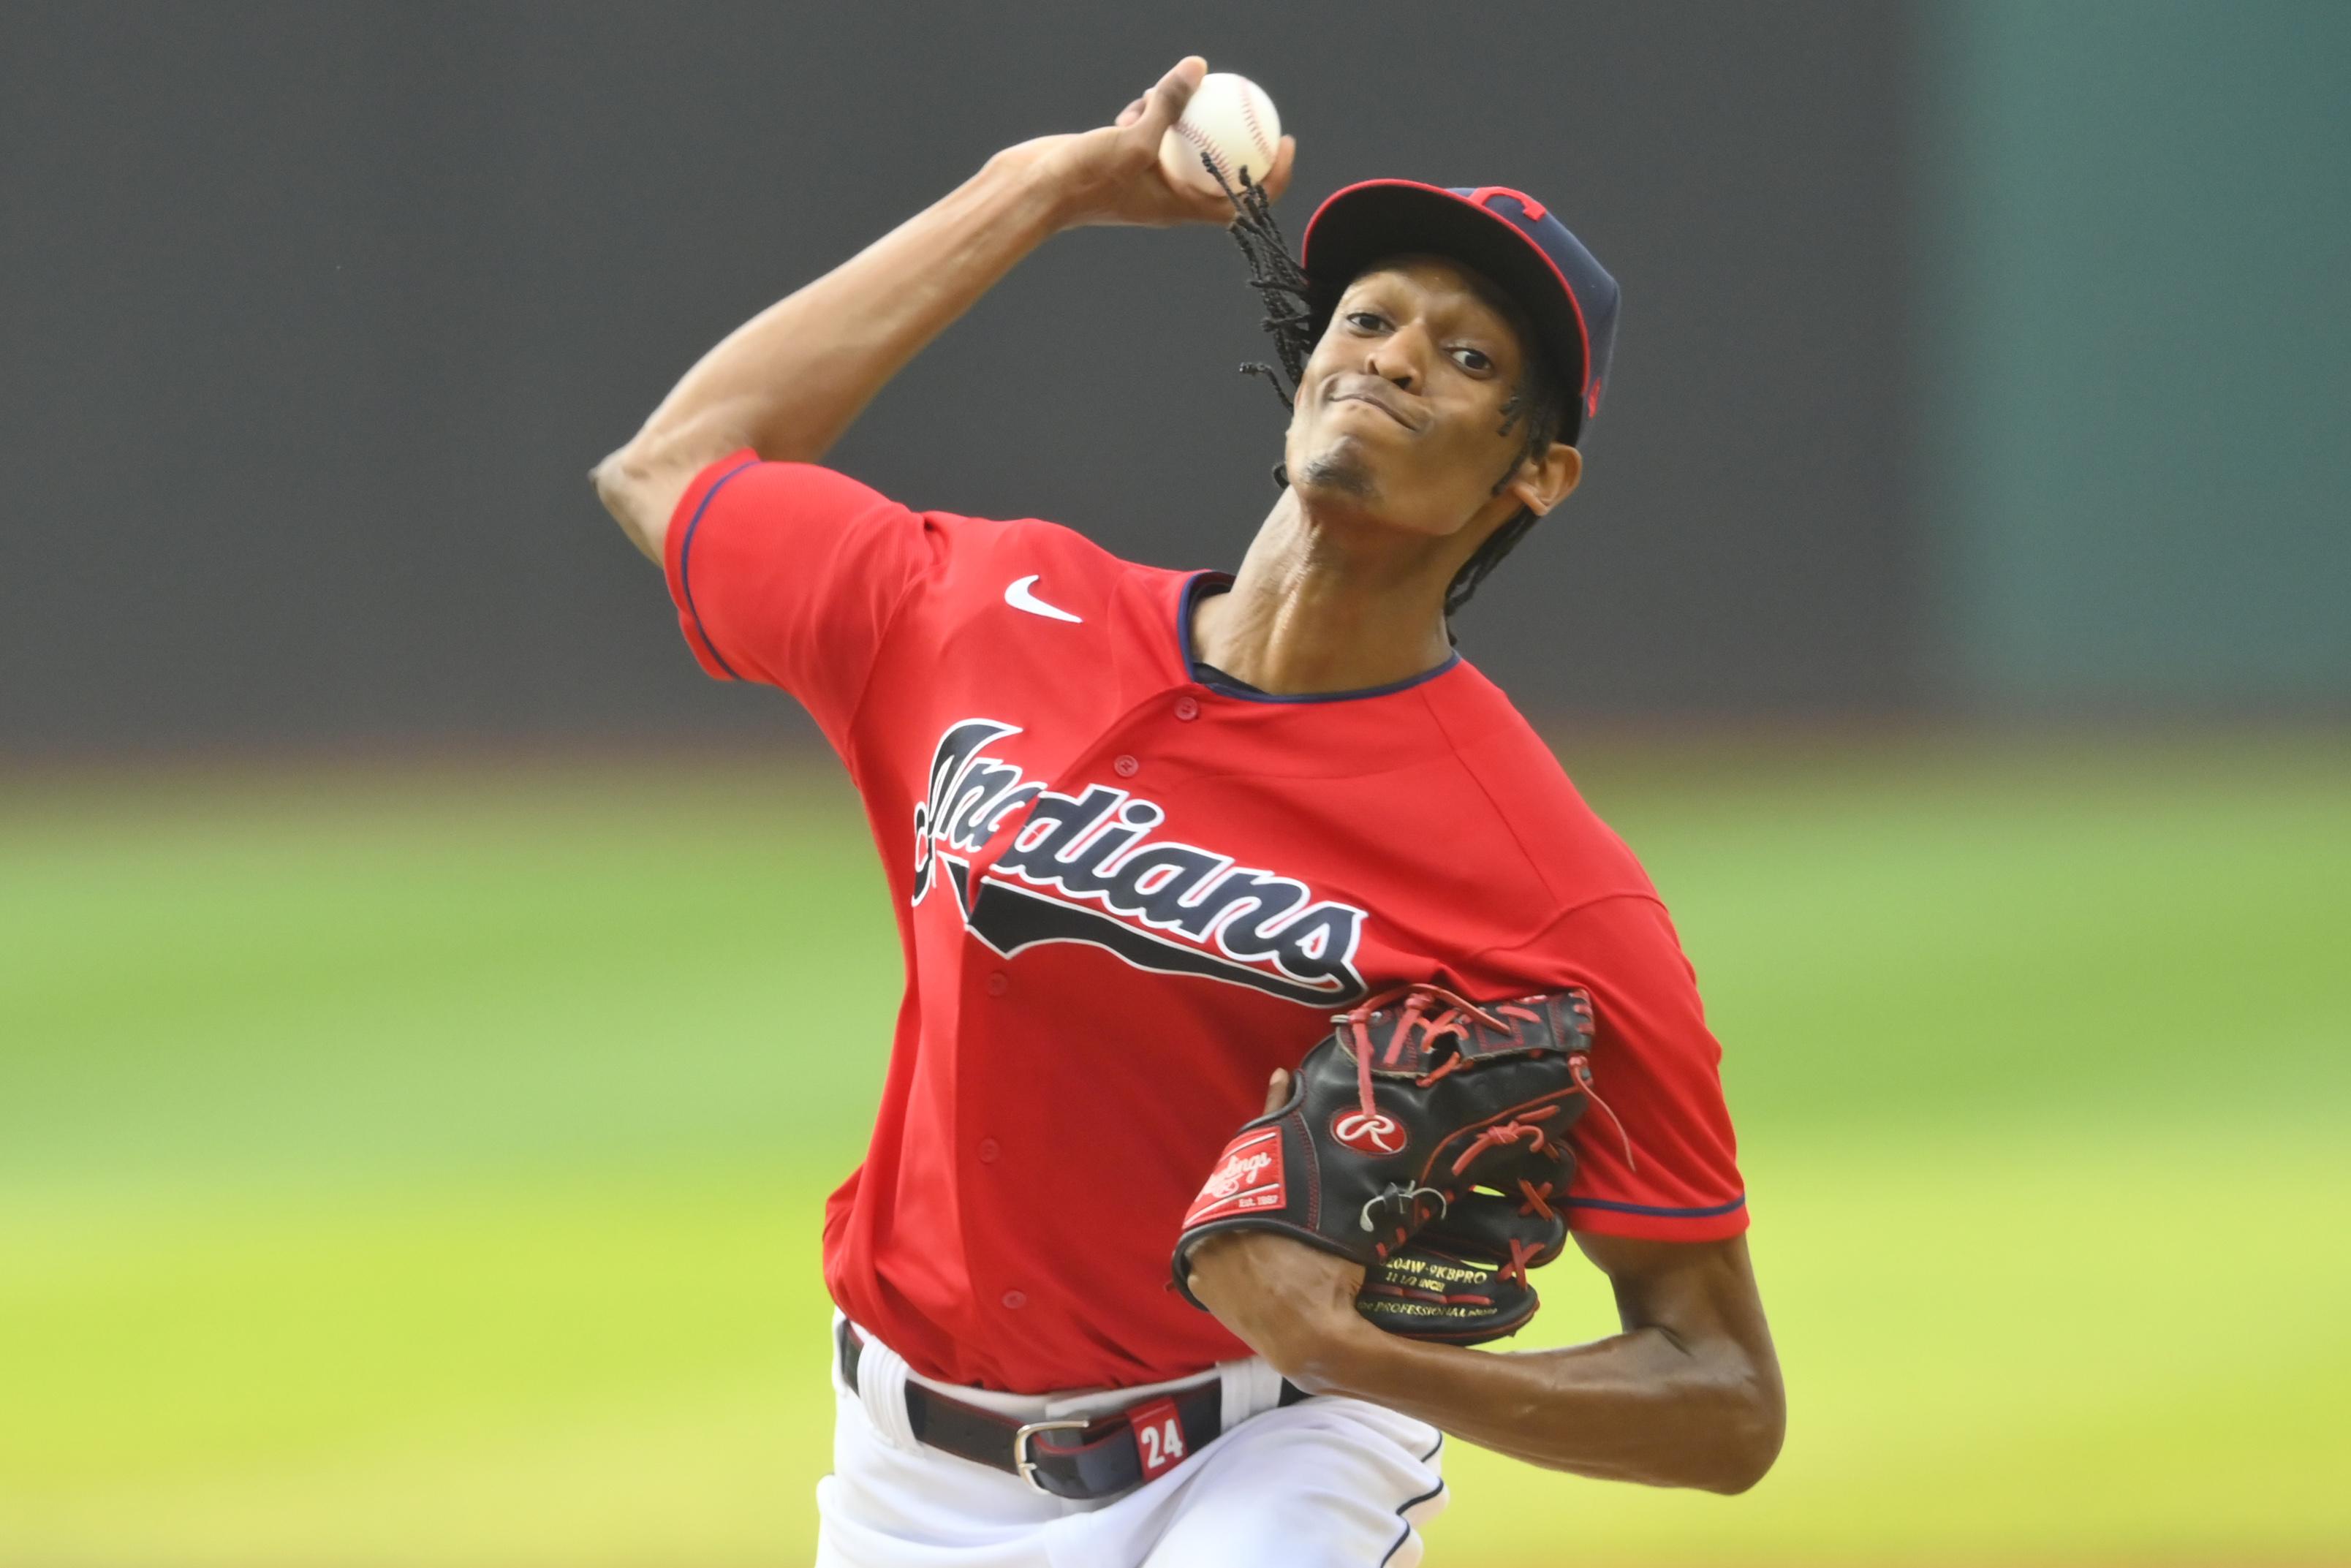 MLB: Oakland Athletics at Cleveland Indians